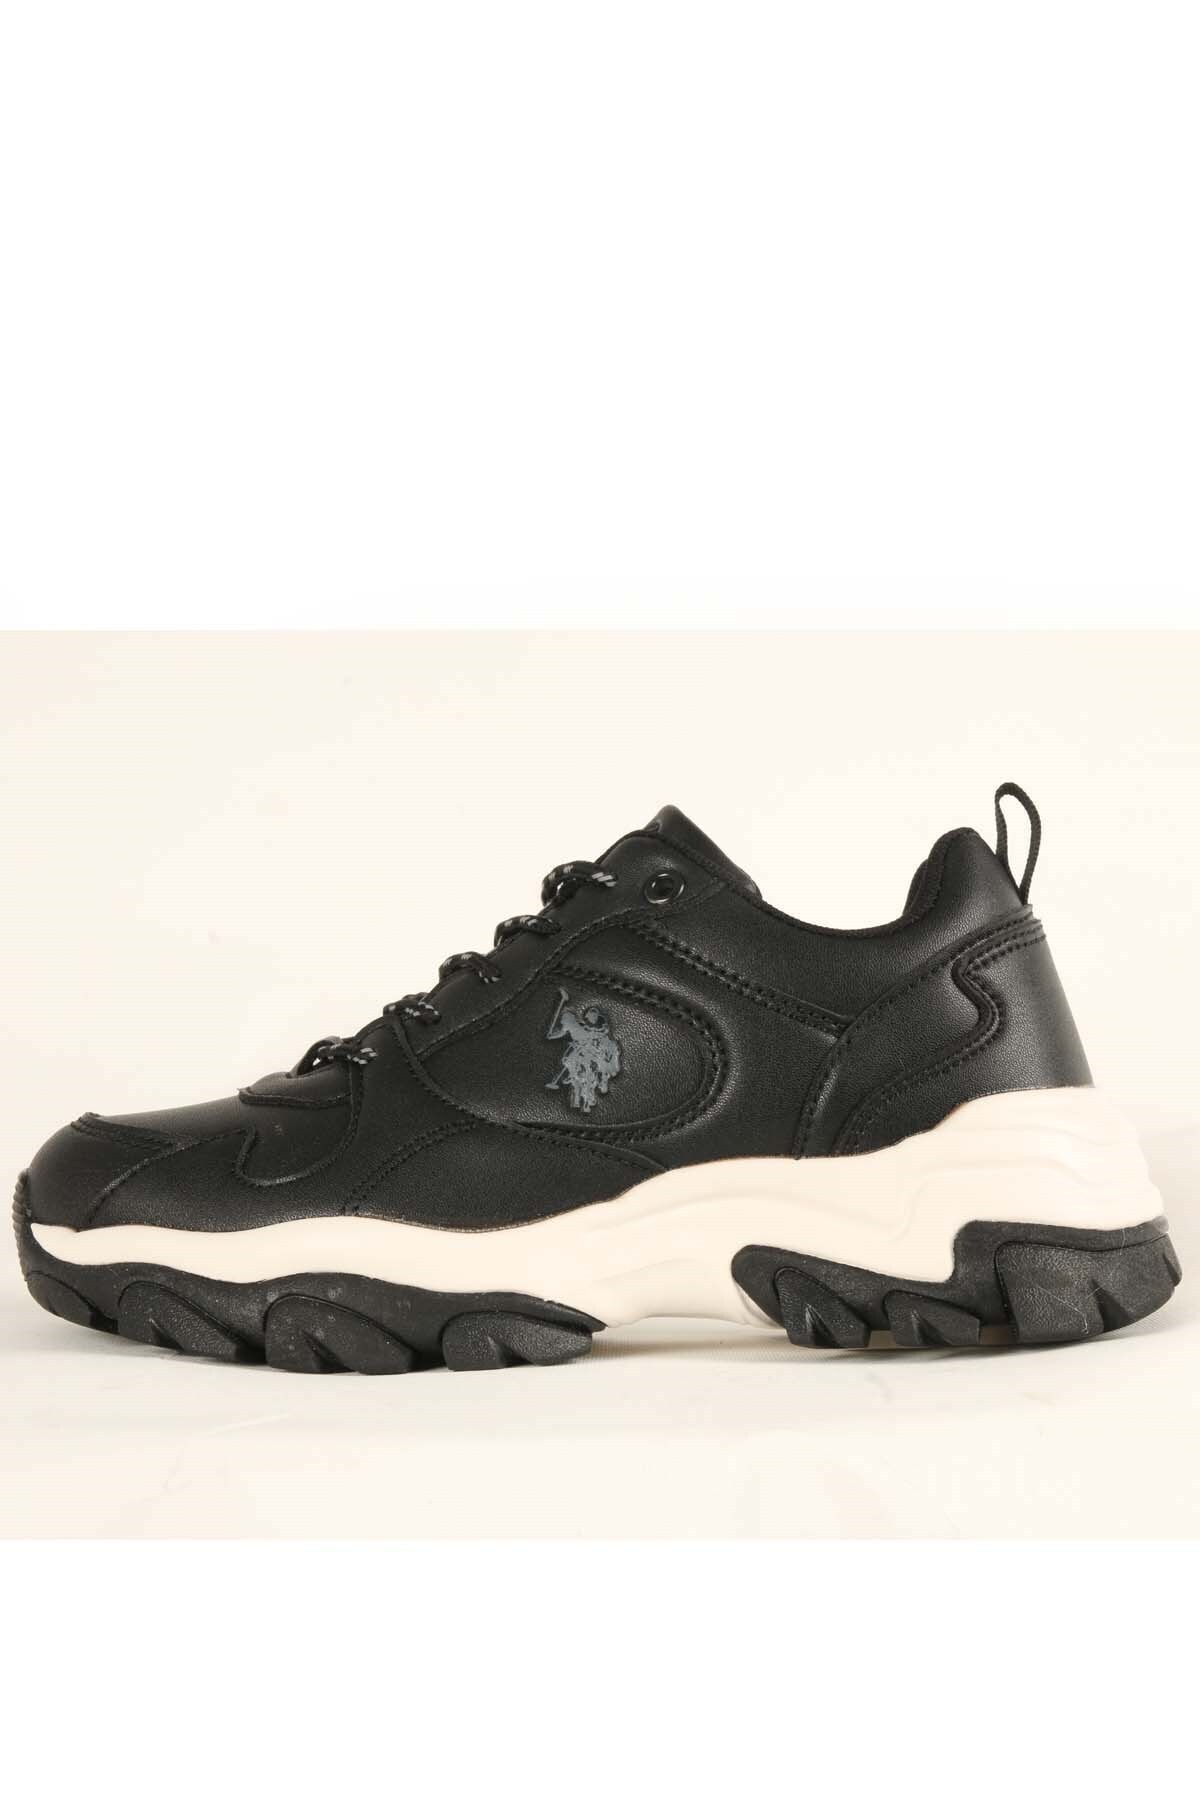 U.S POLO TRACKY Siyah Kadın Fashion Sneaker 100551450 1